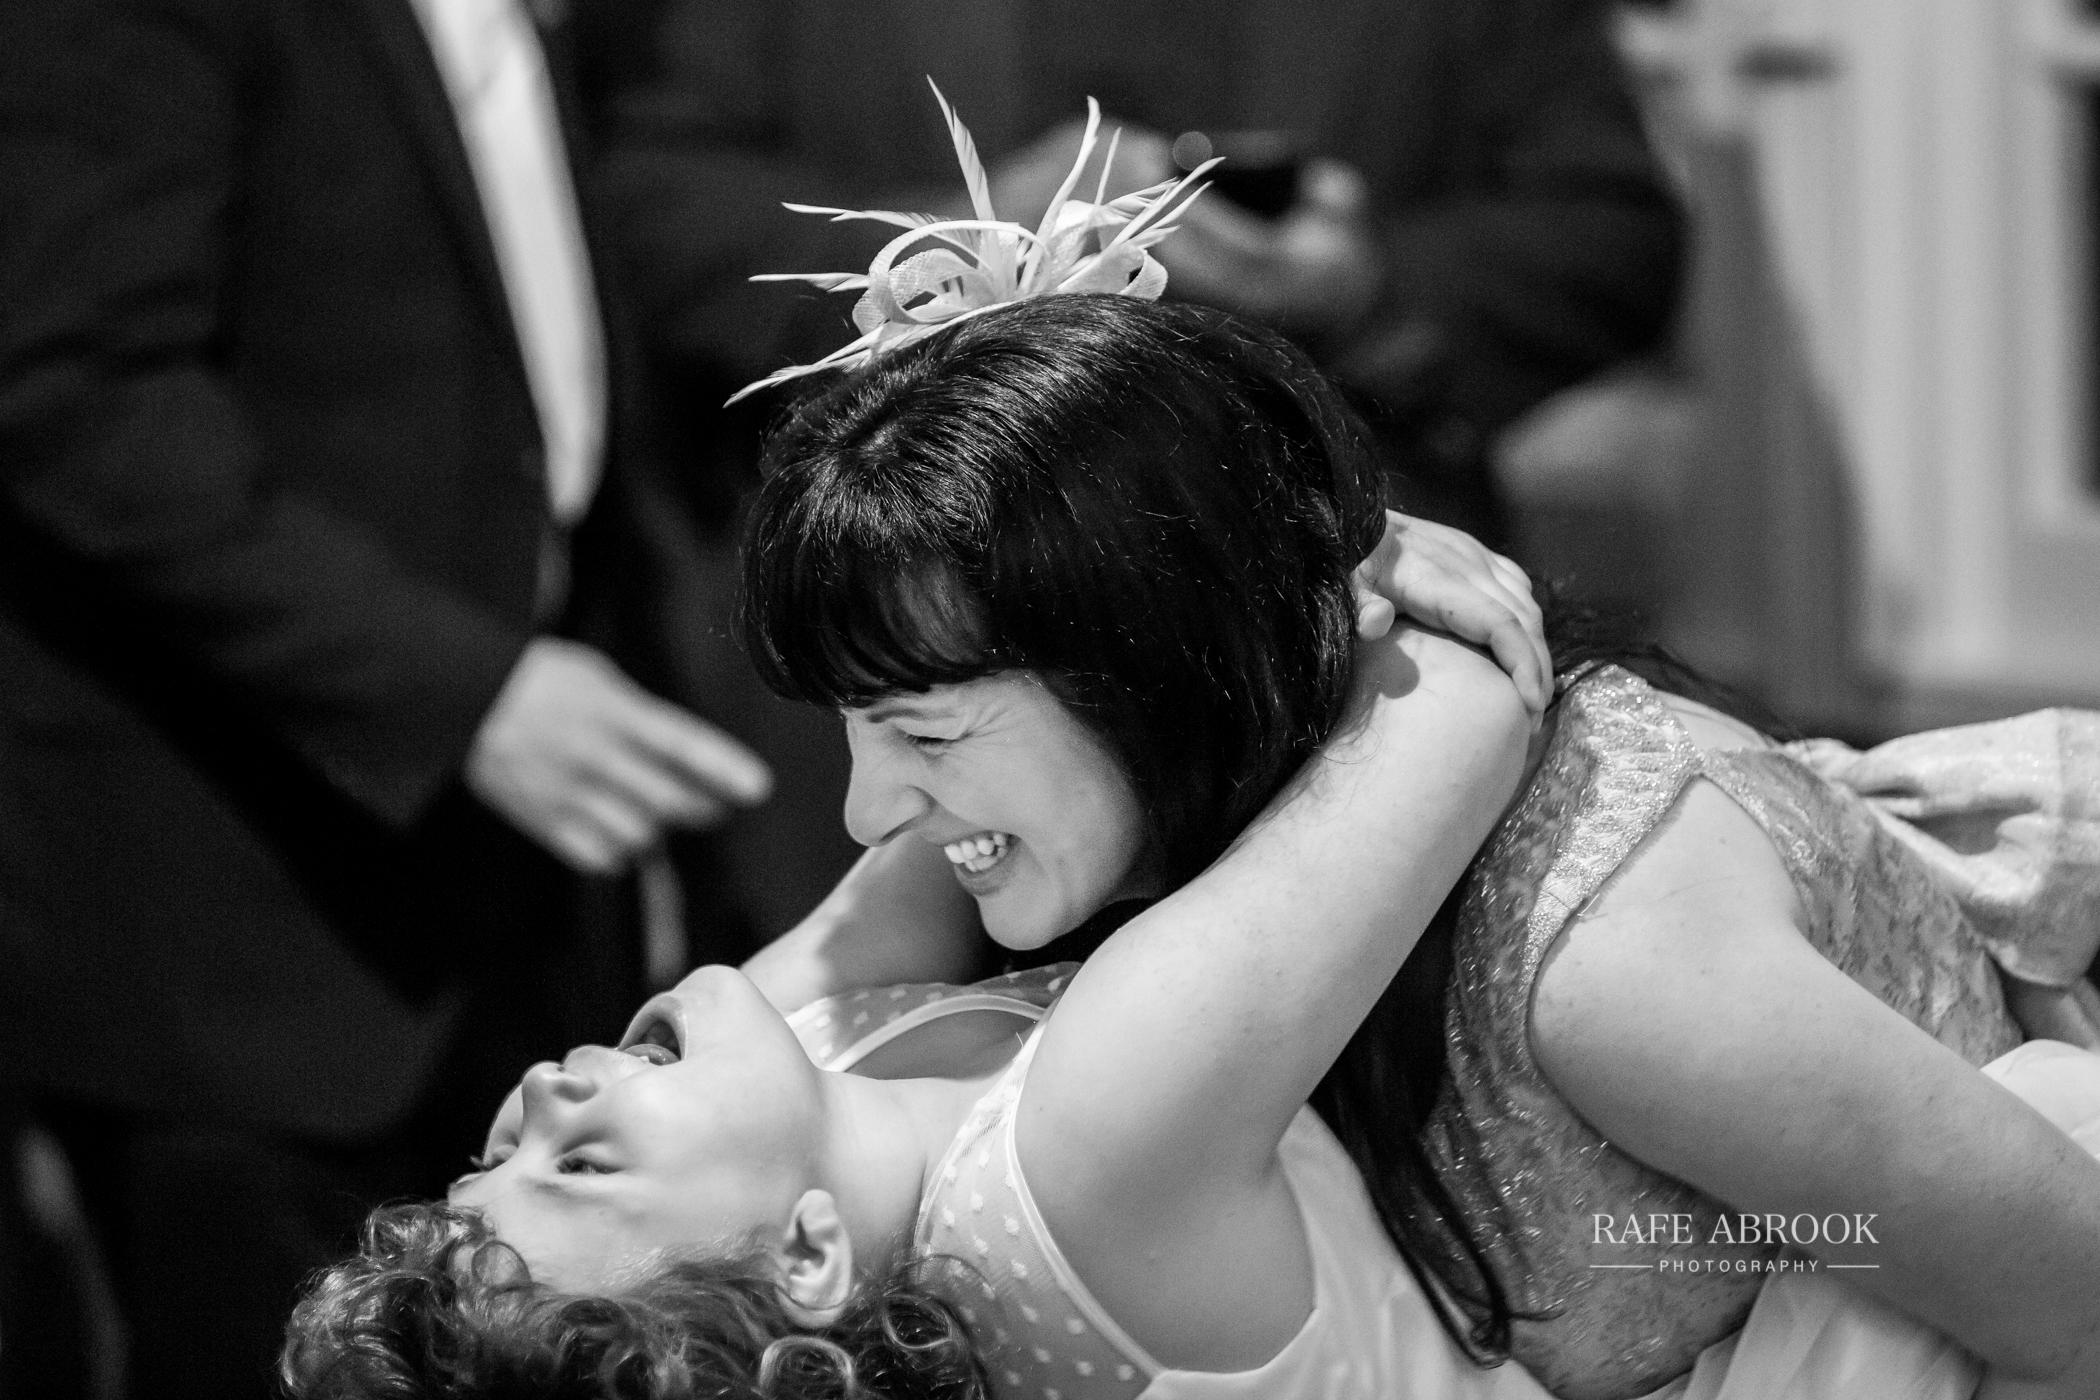 roma & pete wedding hampstead shenley hertfordshire -549.jpg